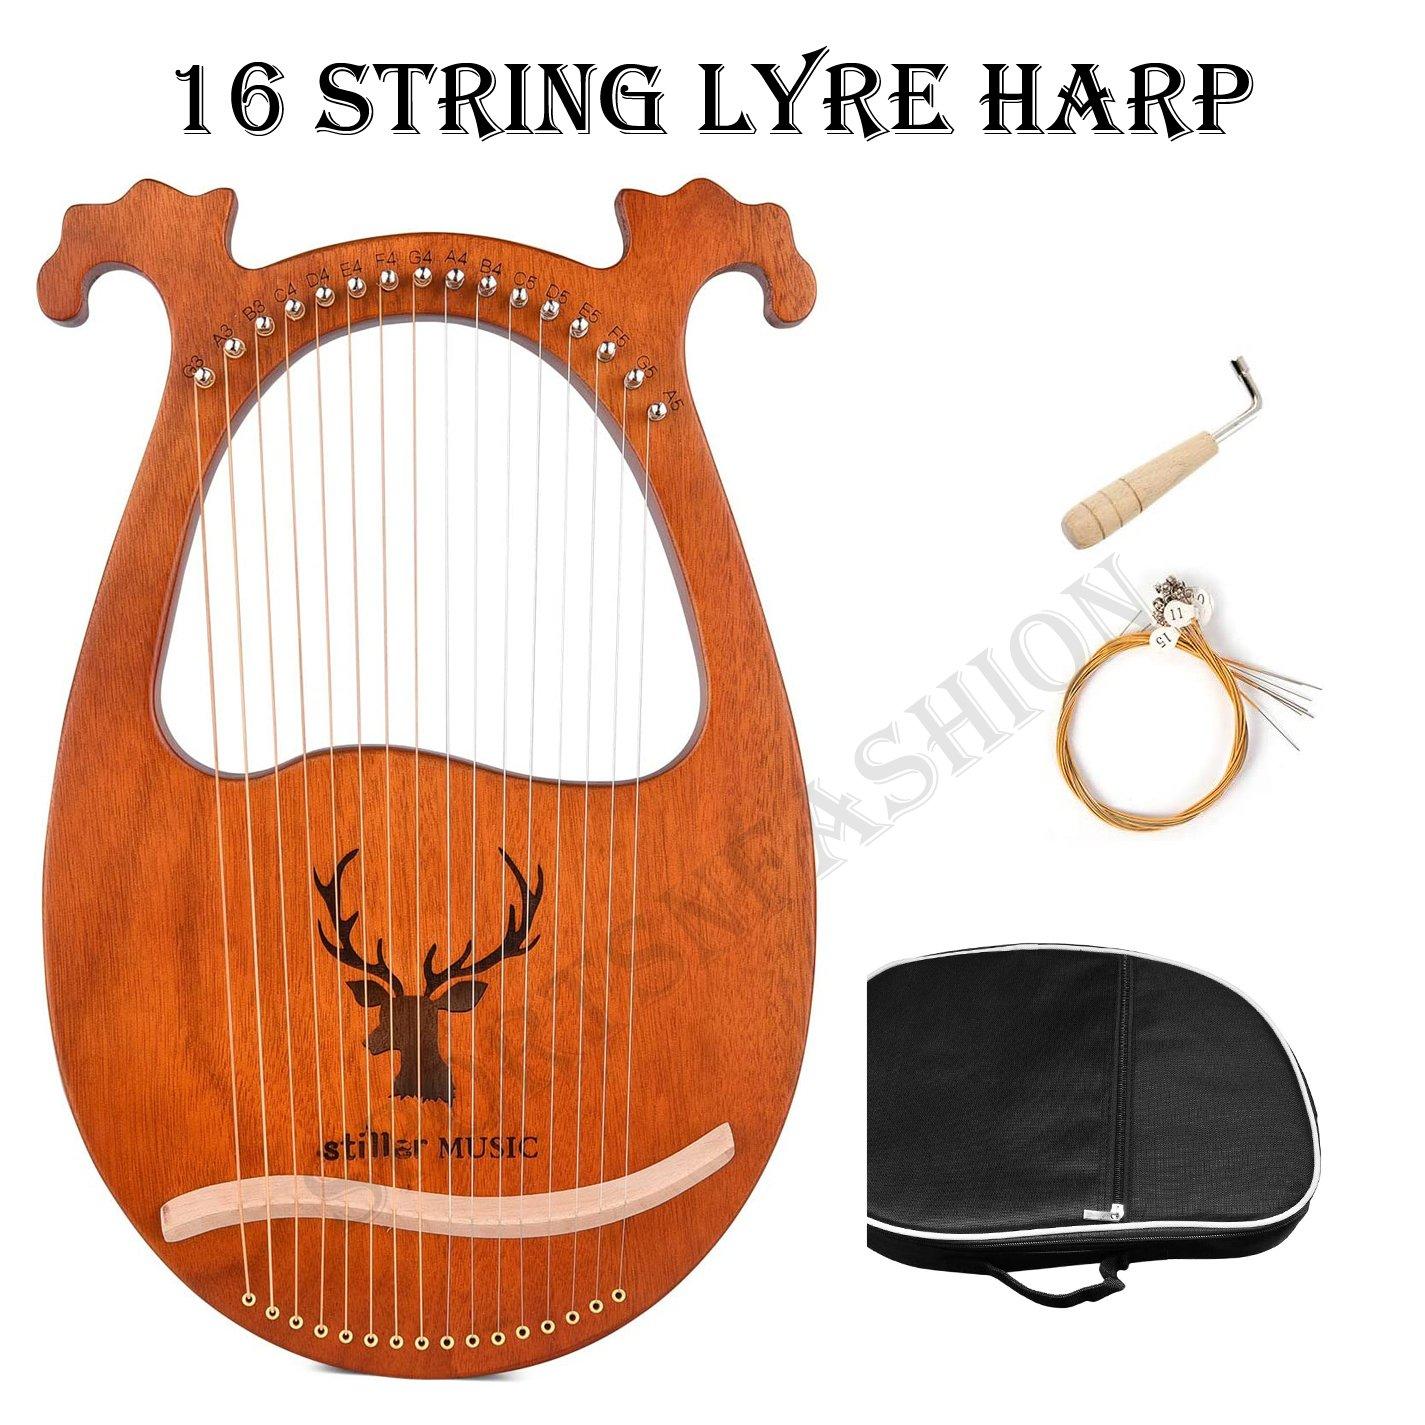 16 String Lyre Harp Solid Wood String Instrument